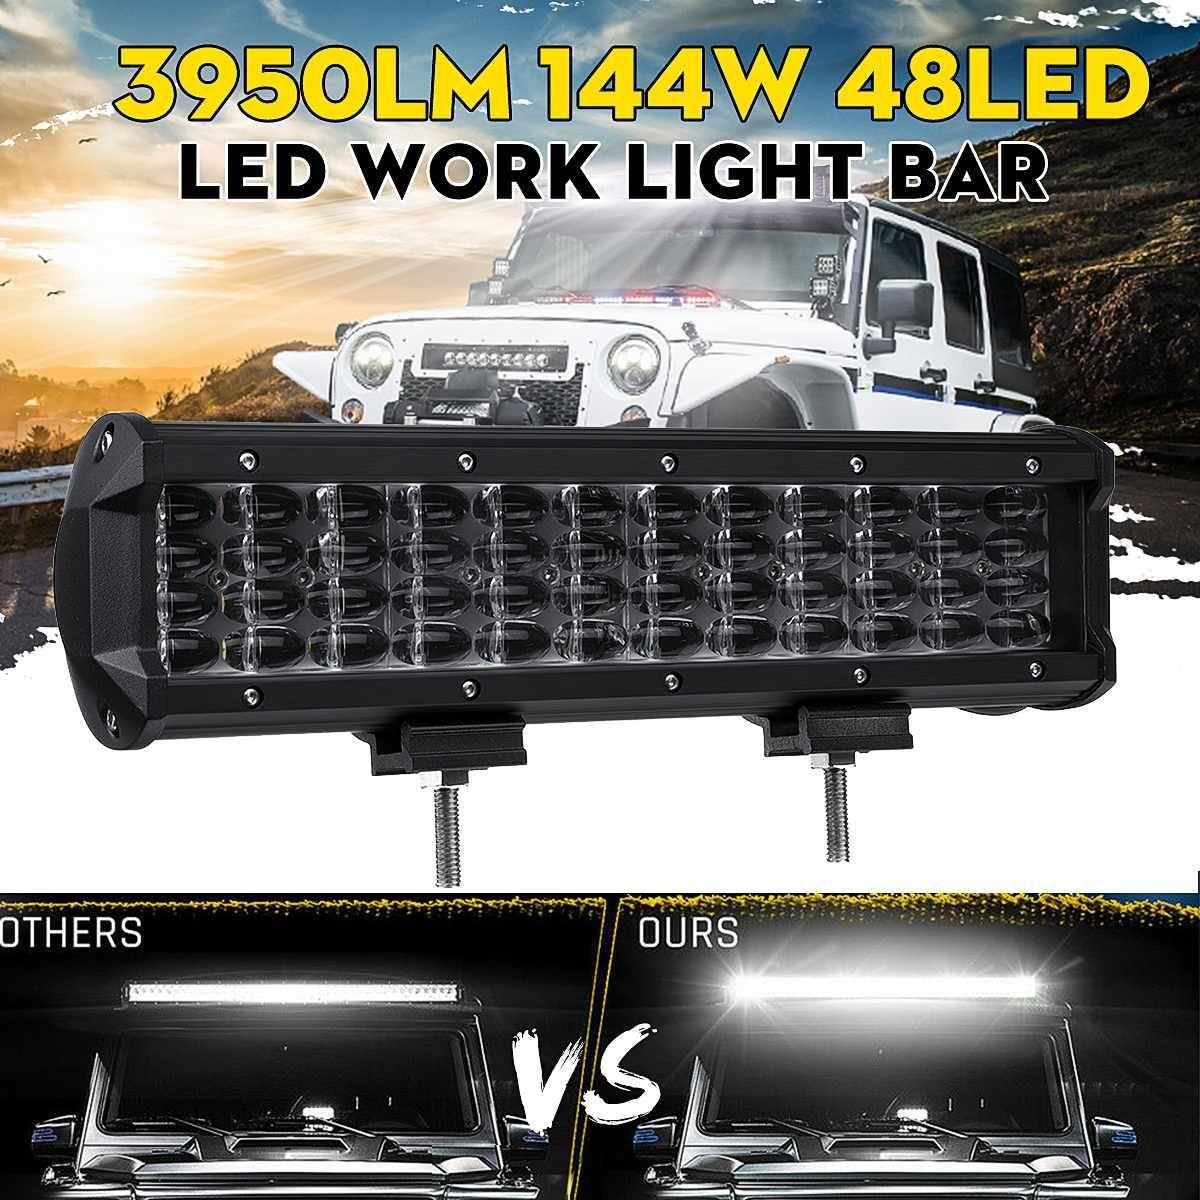 12v 24v 12 Led Car Led Work Light Bar Spot Driving Lamp 4x12 Ip67 For Jeep Driving Offroad Boat Suv Atv Utv Tractor Tru Led Work Light Bar Lighting Work Lights